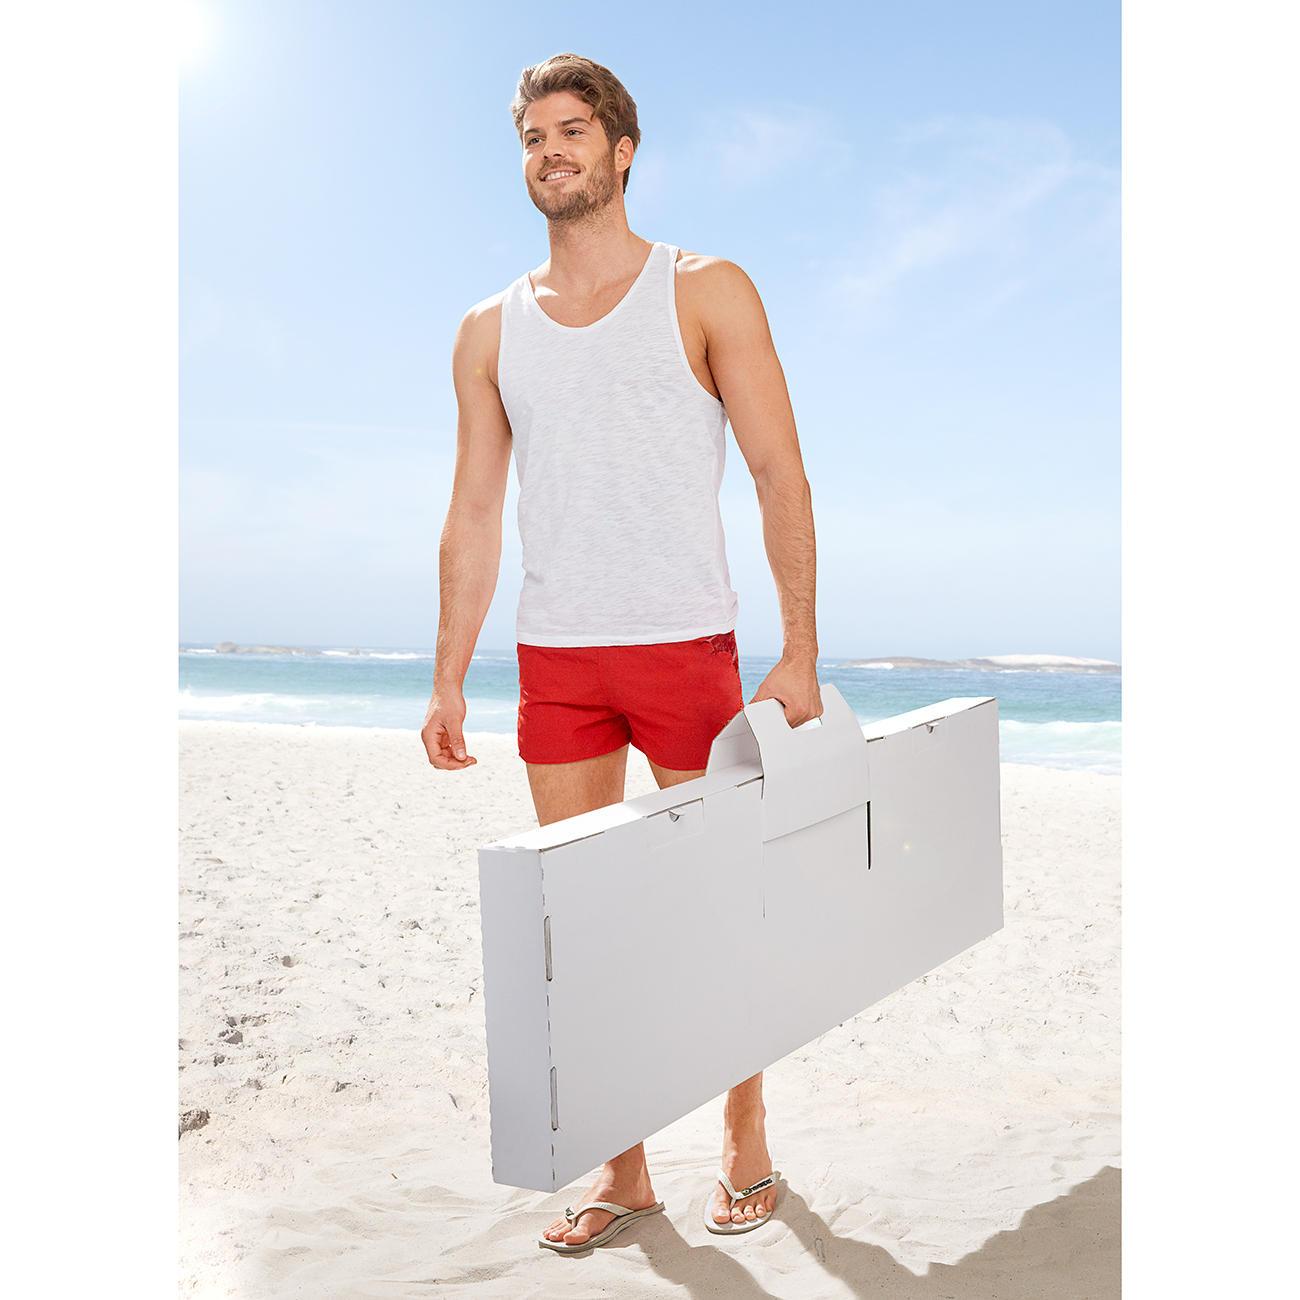 kickpack kartoni pappkicker karton wei online kaufen. Black Bedroom Furniture Sets. Home Design Ideas